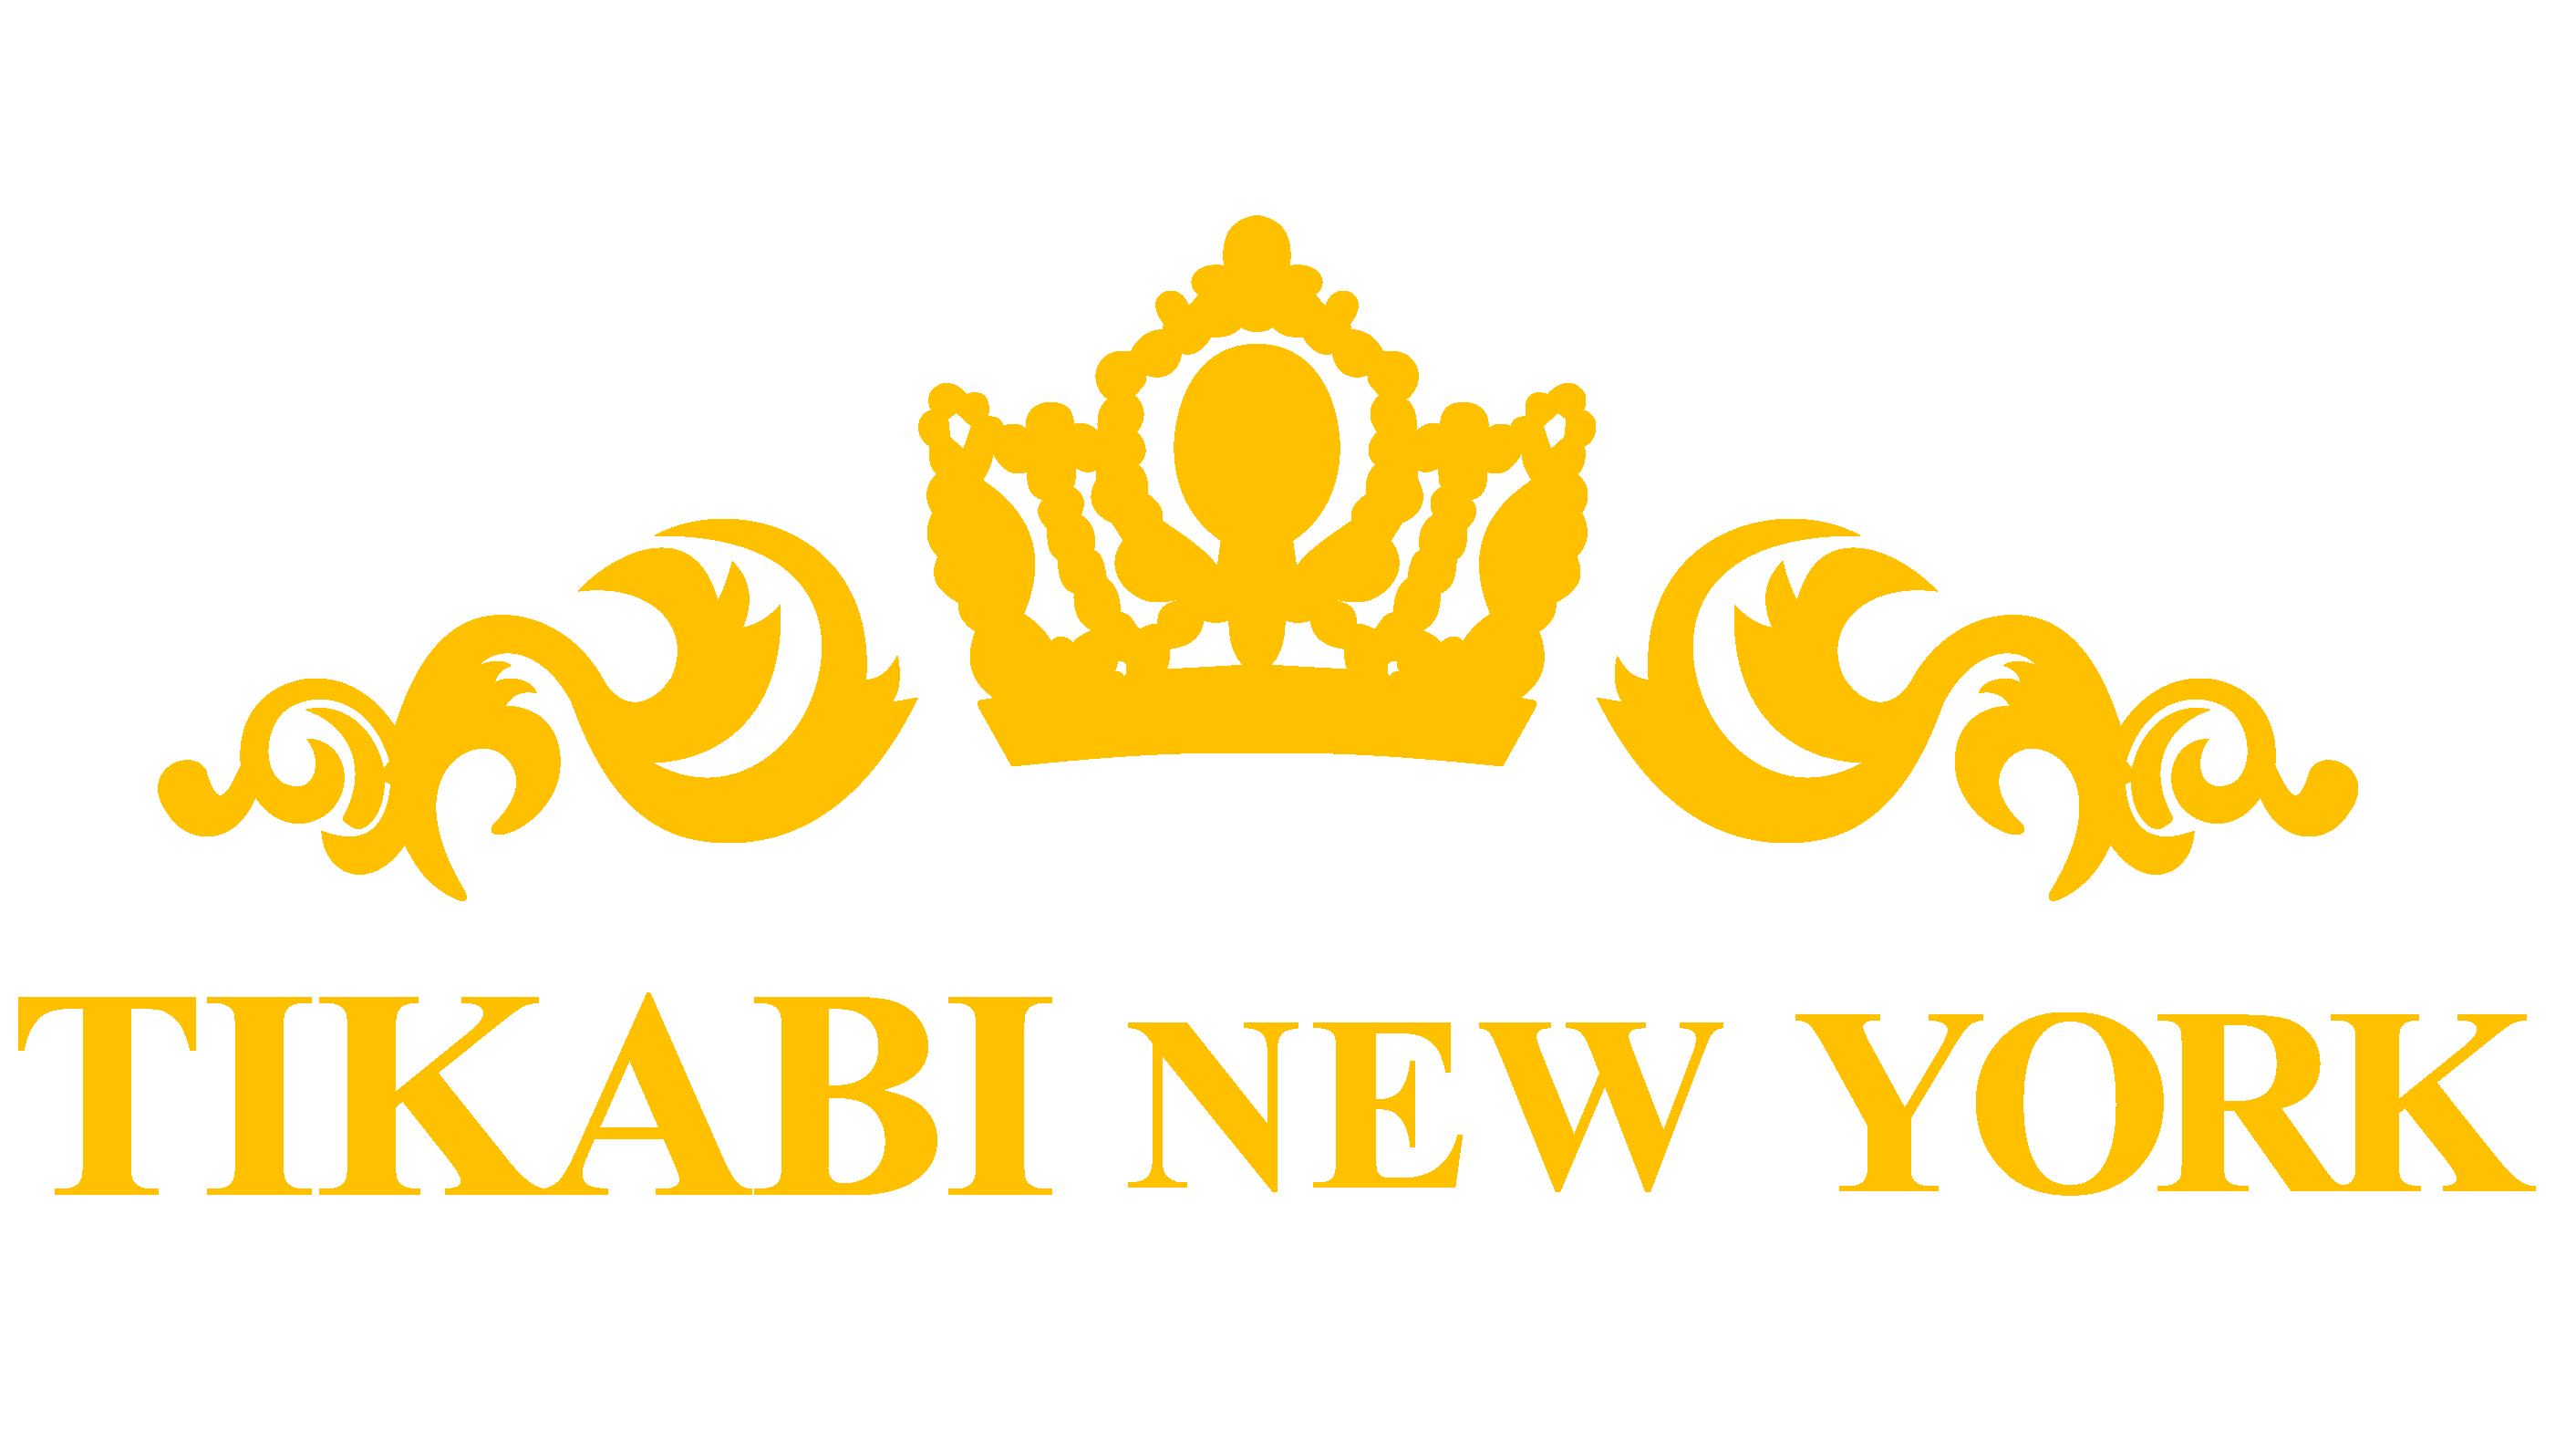 Viện thẩm mỹ Tikabi New York